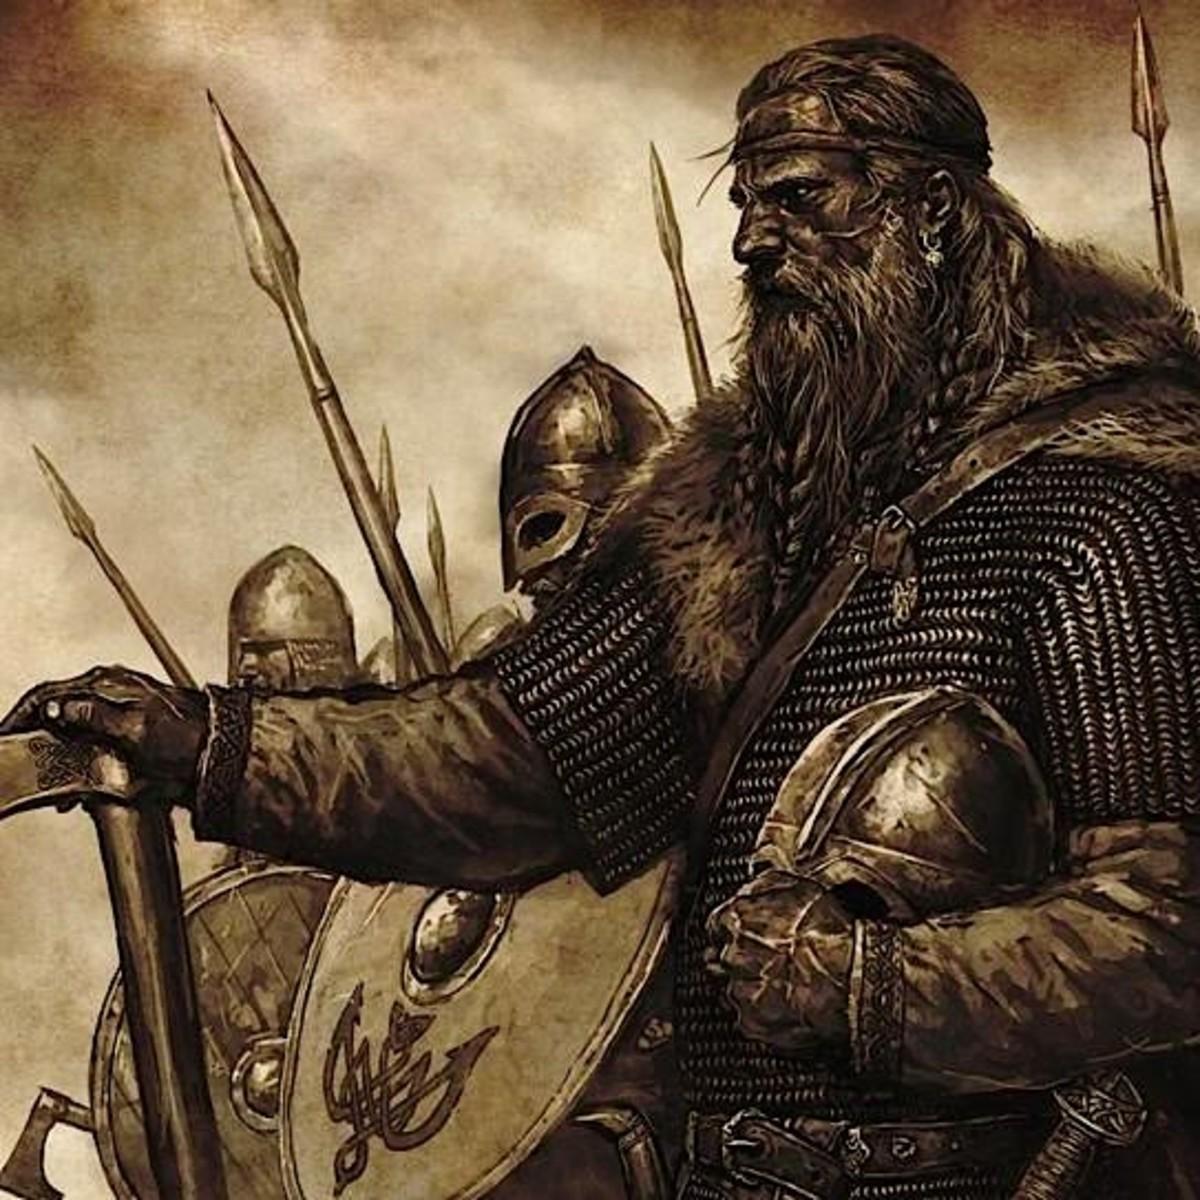 The Saga of Hrolf 'Kraki' - 3: Hrolf Is Born out of a Flawed Love Match